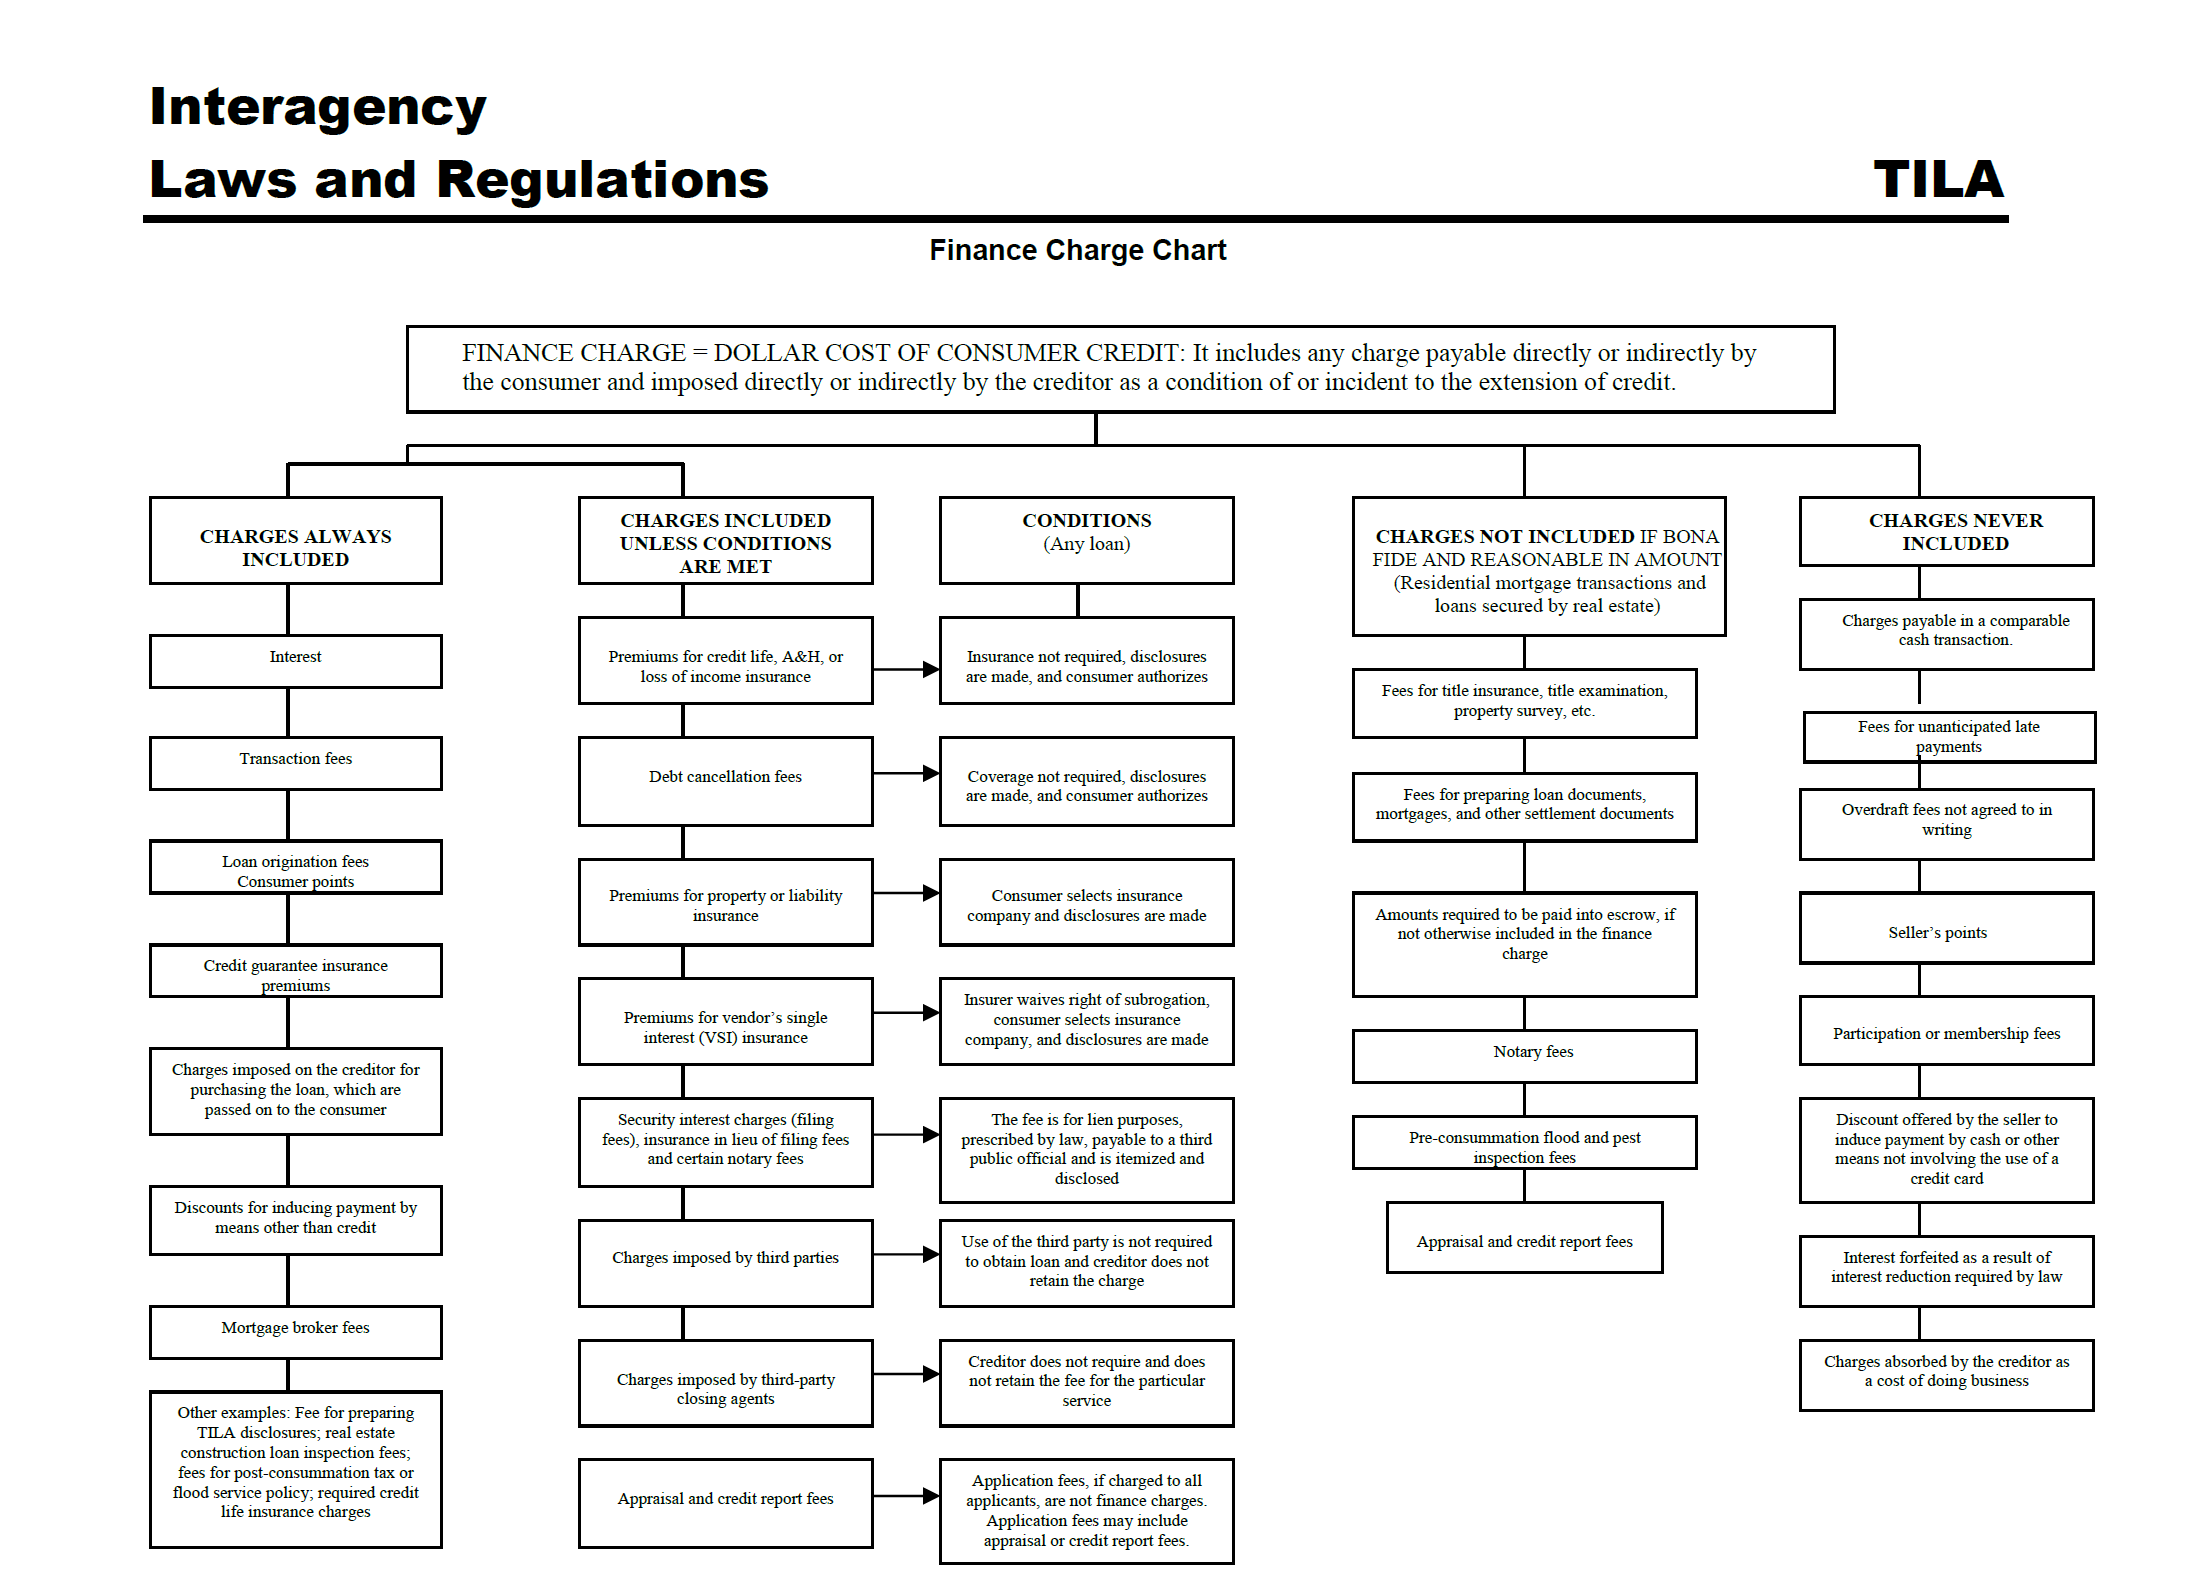 Finance Charge Chart